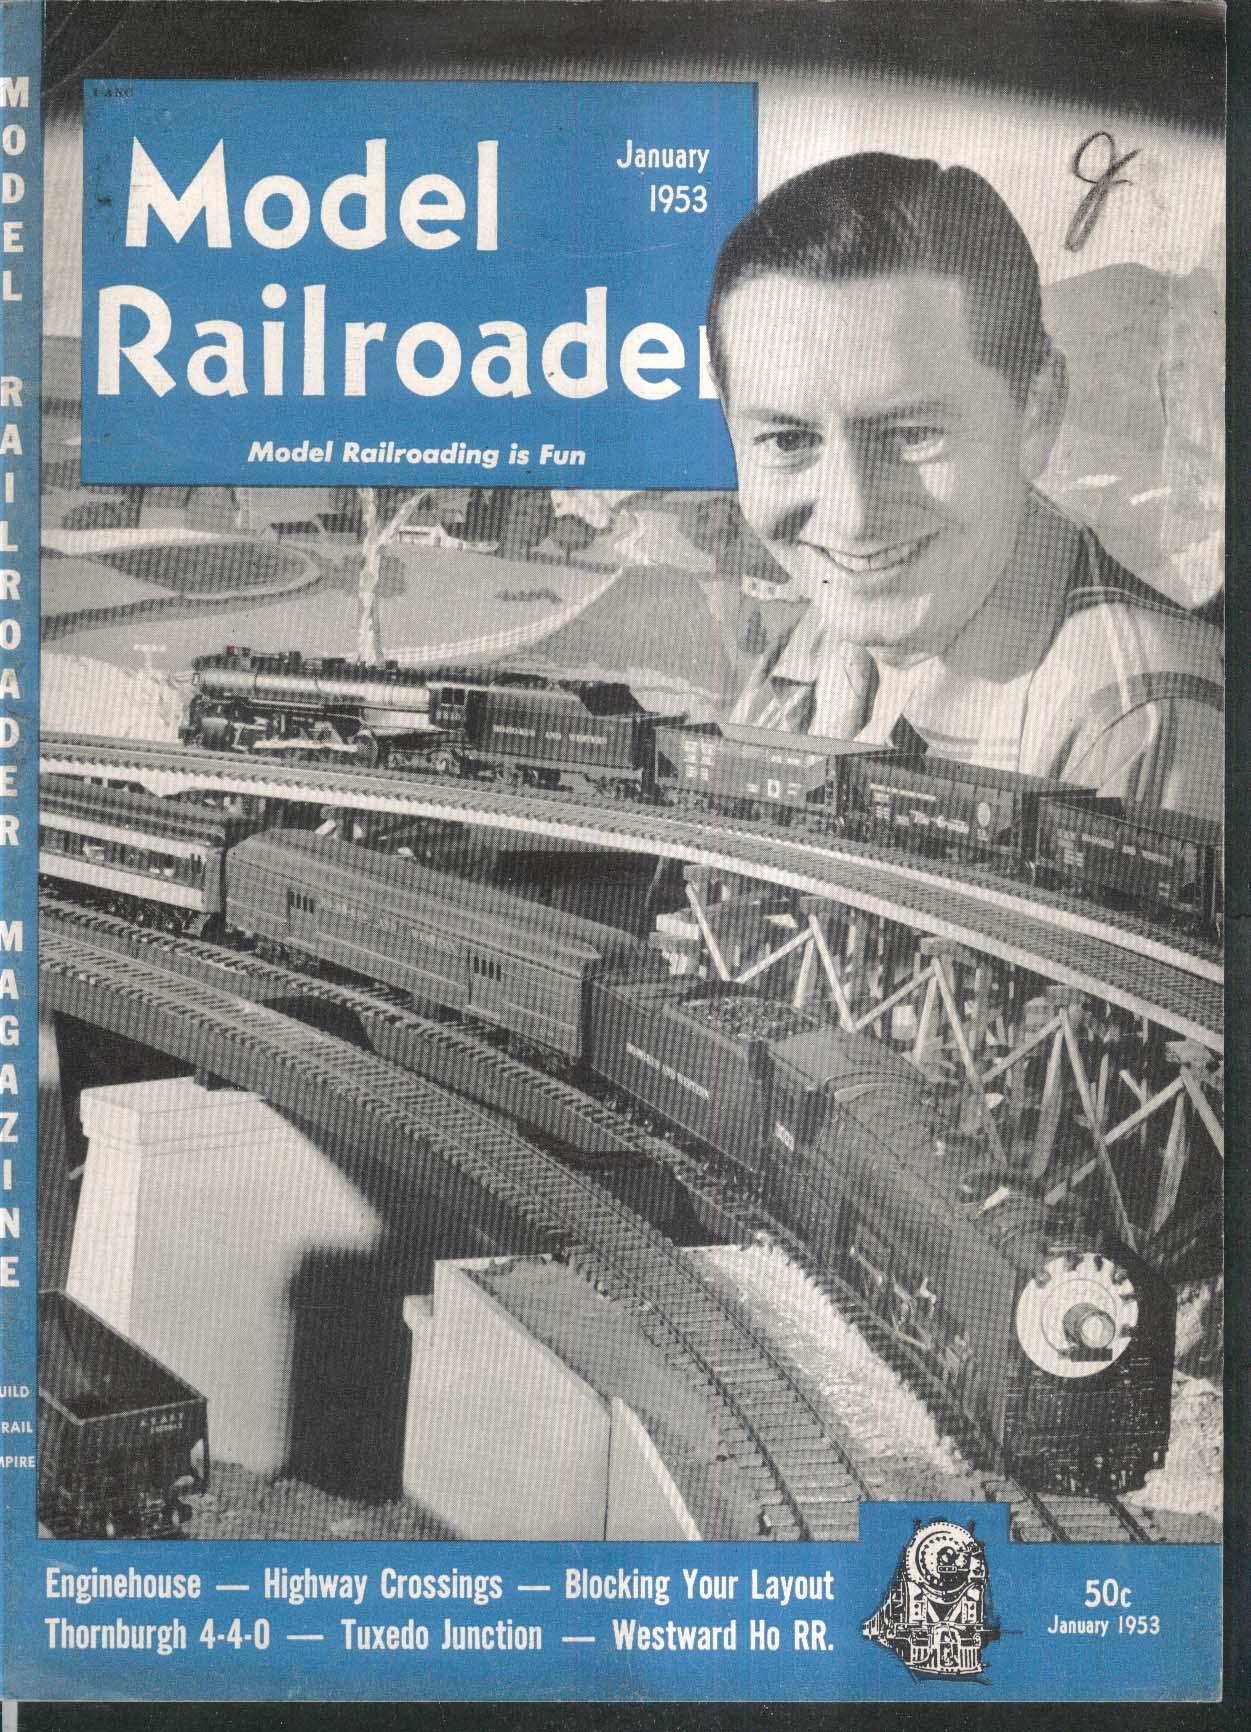 MODEL RAILROADER Enginehouse Highway Crossings Thornburgh 4-4-0 1 1953